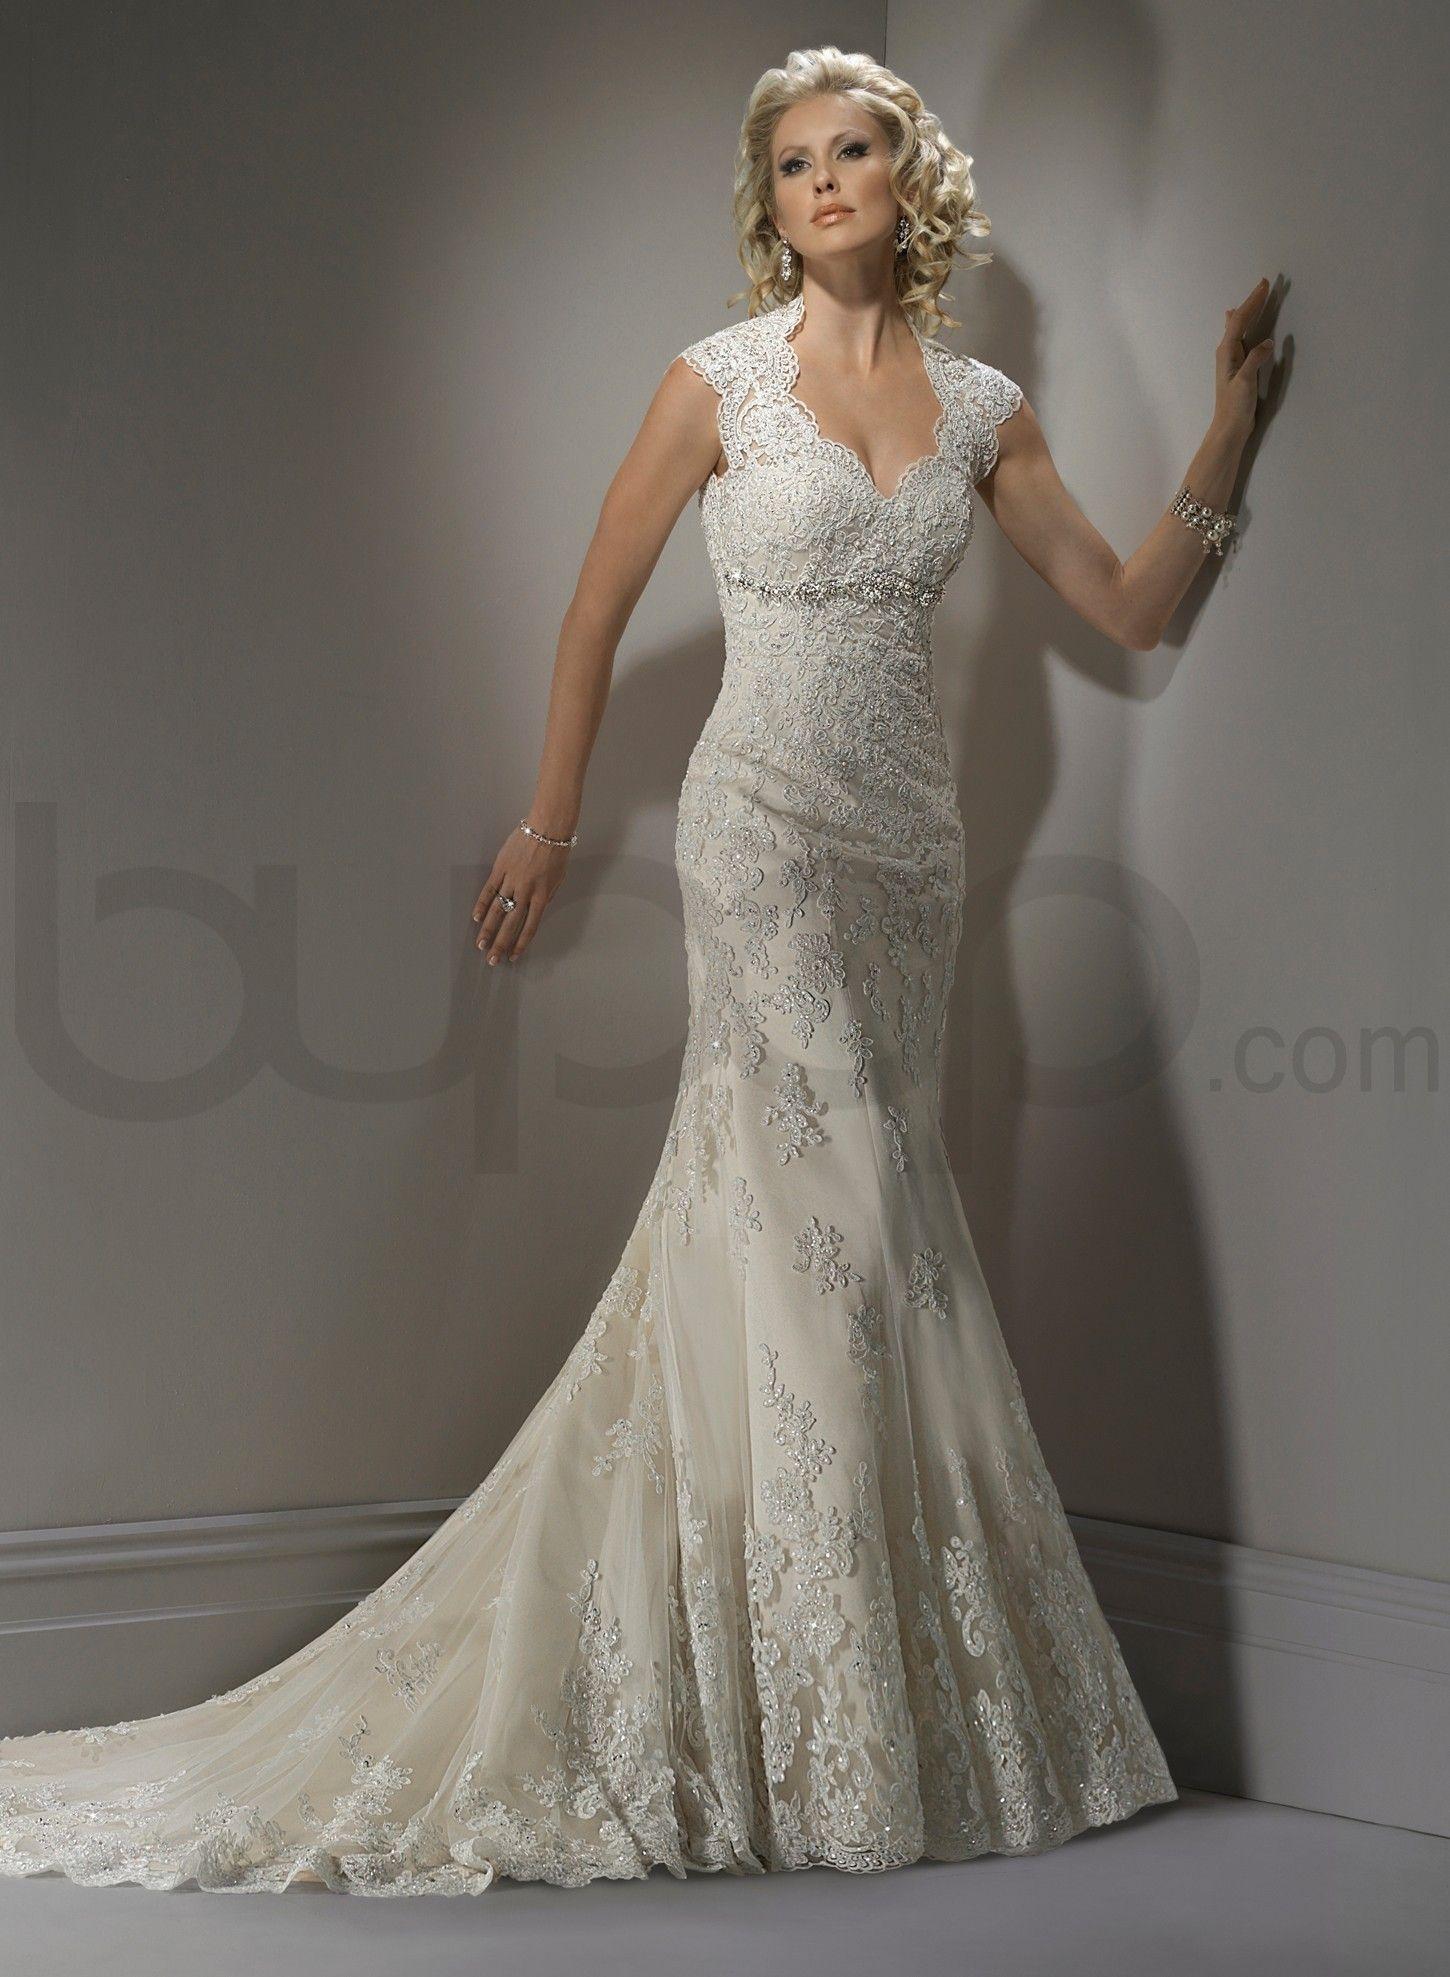 Lace Sweetheart Neckline A-line Wedding Dress | My Wedding ...